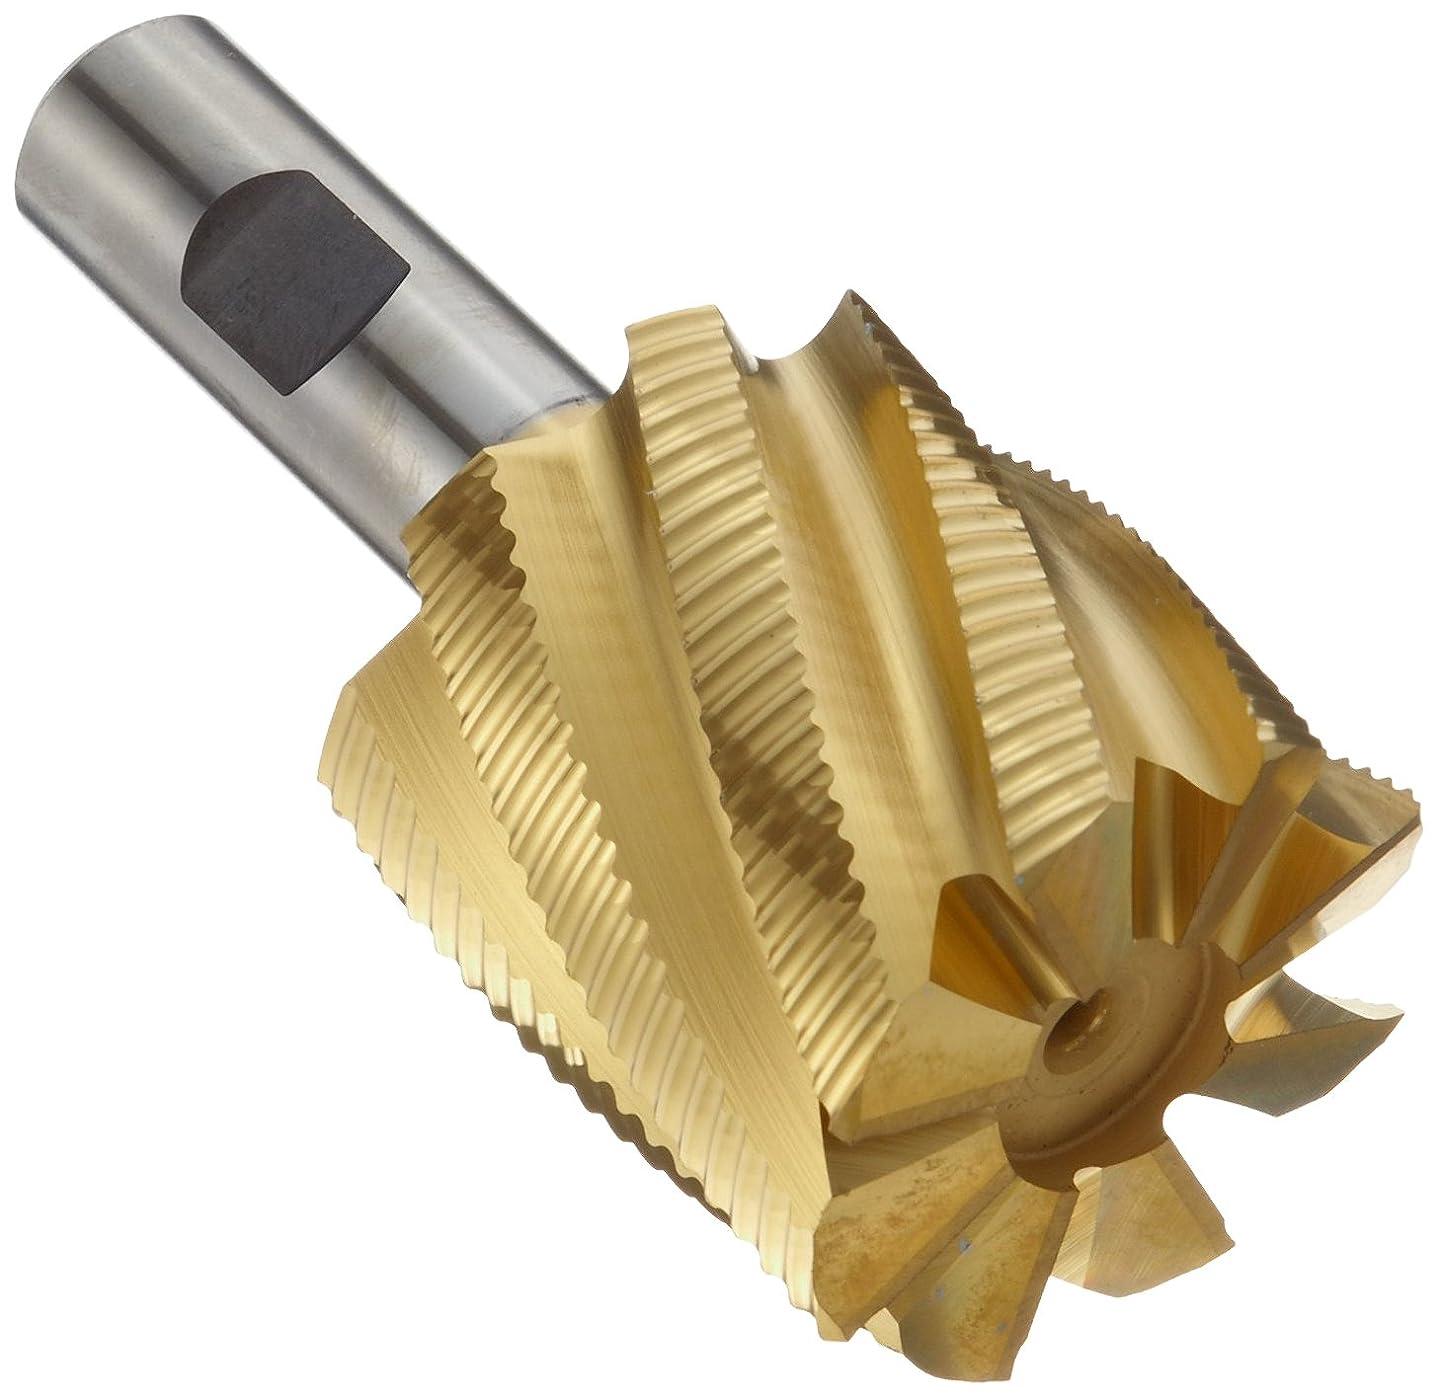 Niagara Cutter N44520 Cobalt Steel Square Nose End Mill, Weldon Shank, TiN Finish, Roughing Cutting, Non-Center, 30-Degree, 4-Flute, 3.375